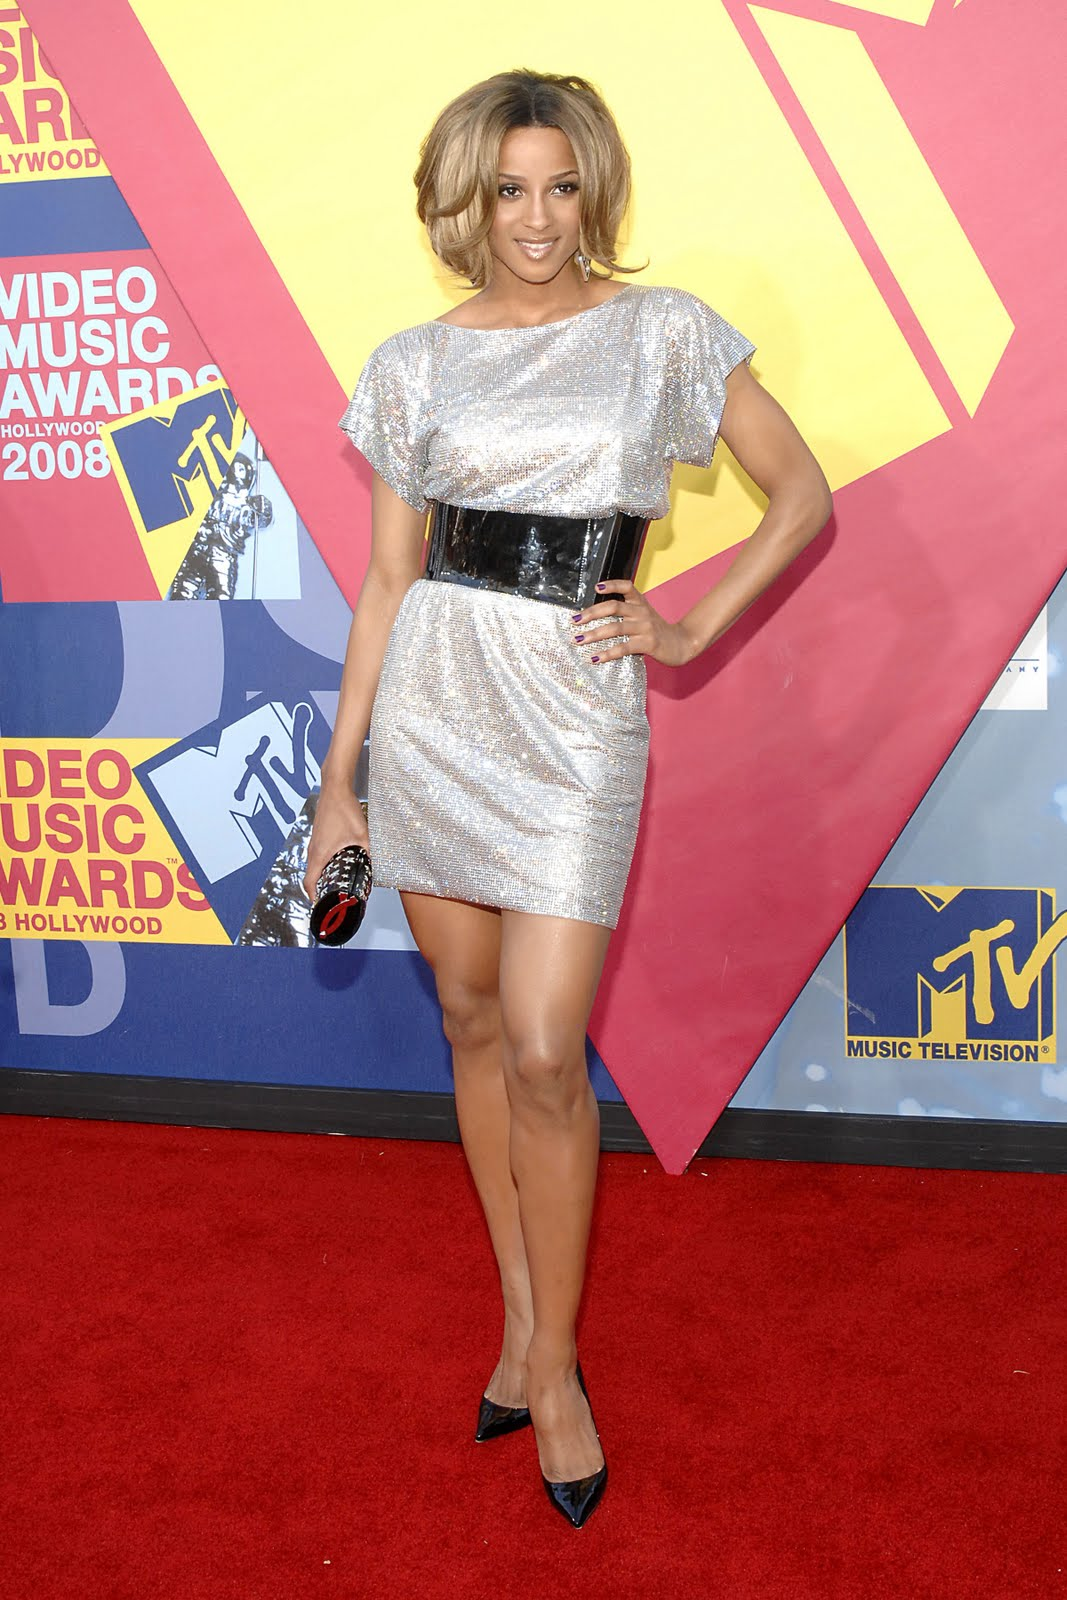 http://4.bp.blogspot.com/_LTi0R8IRkIs/S9Srv_MuFbI/AAAAAAAAB4c/fvbqgxDx6Zg/s1600/Ciara_2008_MTV_Video_Music_Awards_CU_ISA_0005_122_775lo.jpg